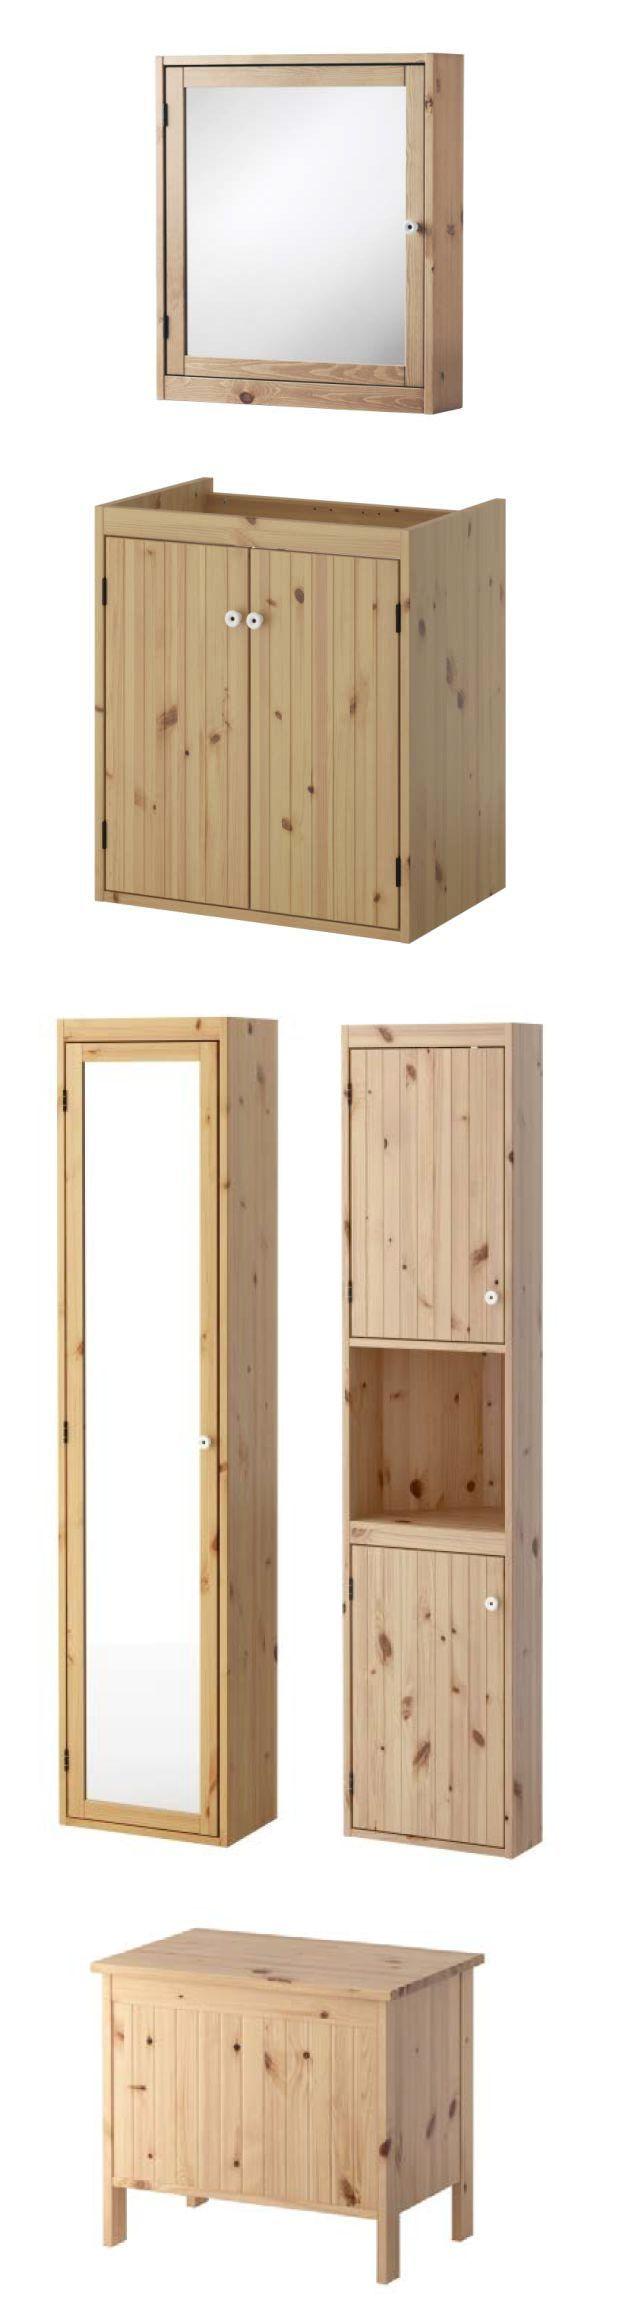 Bathroom Drawers Ikea 17 Best Ideas About Ikea Bathroom Furniture On Pinterest Ikea